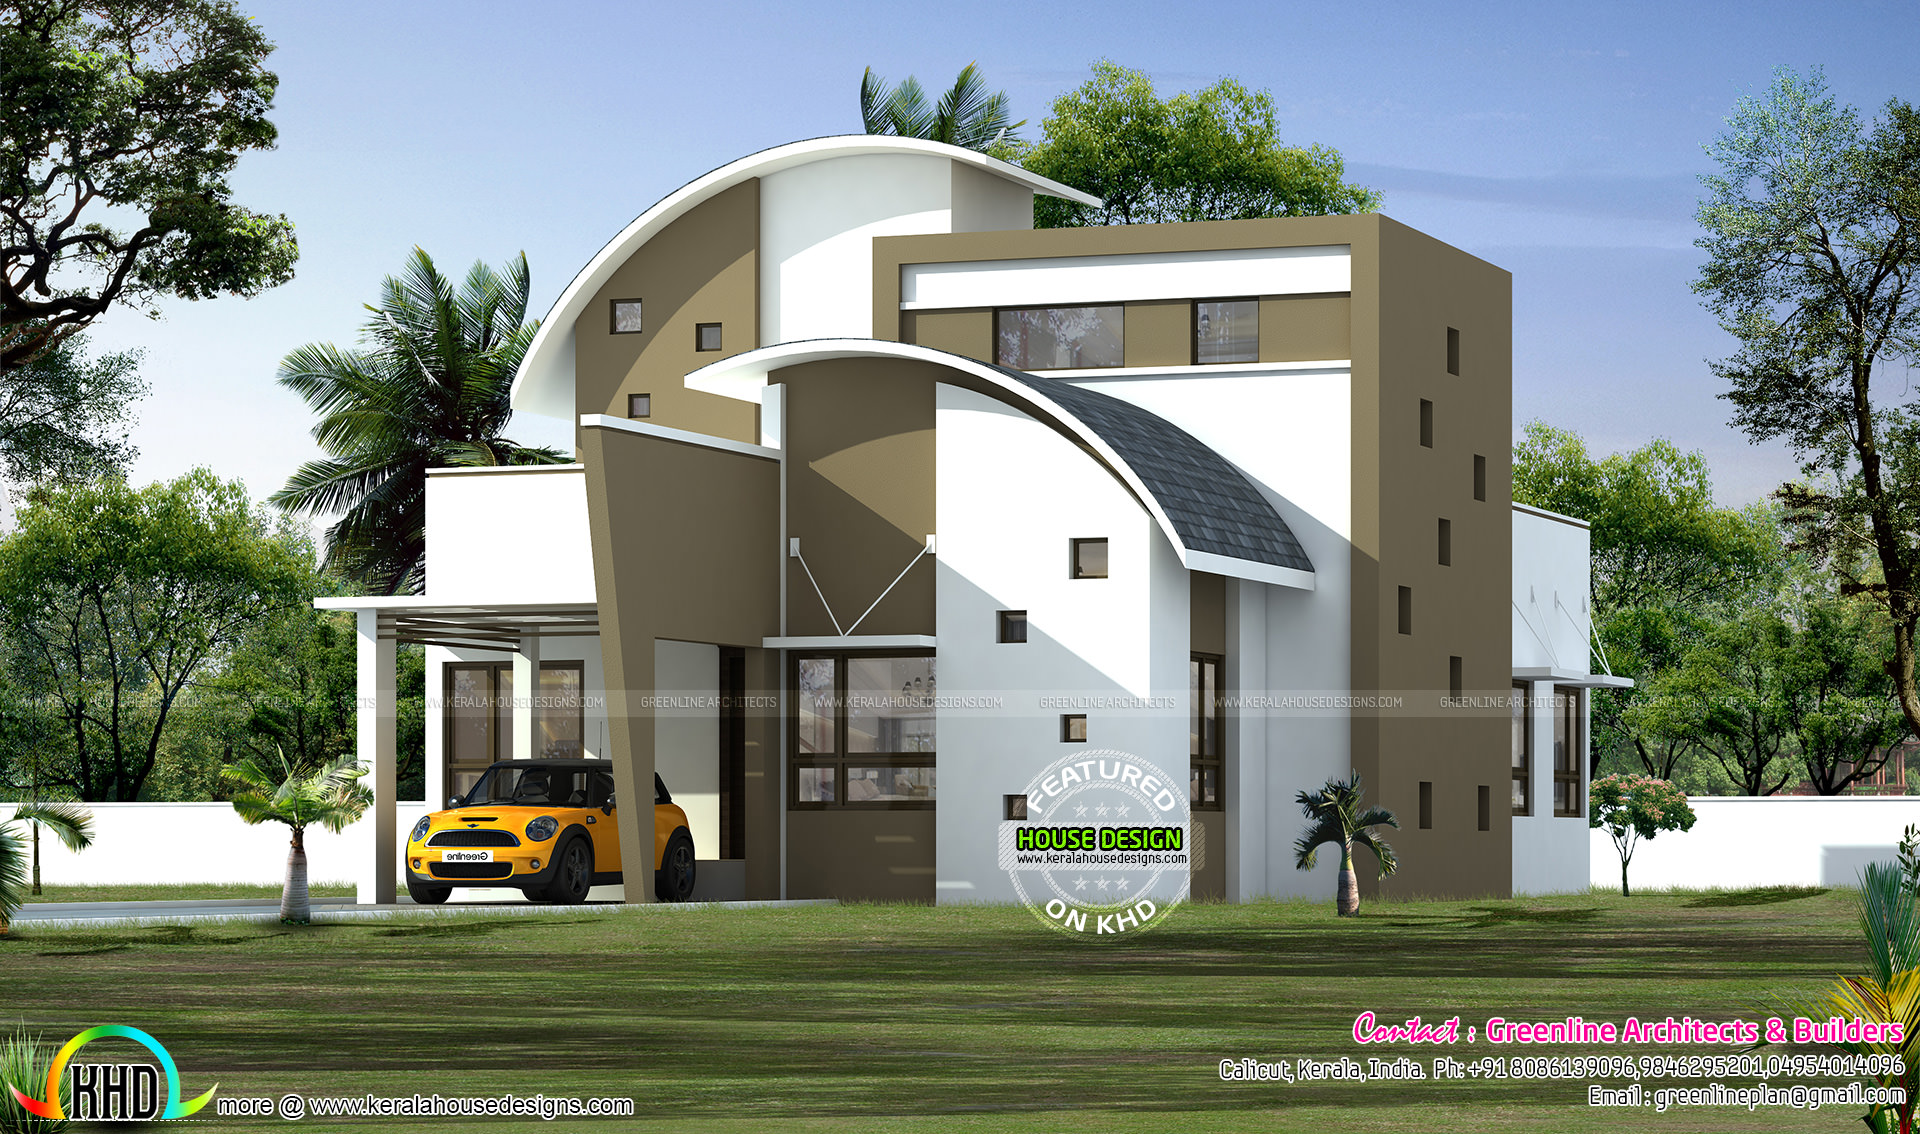 Superb single floor house design kerala home design and for Single floor modern house